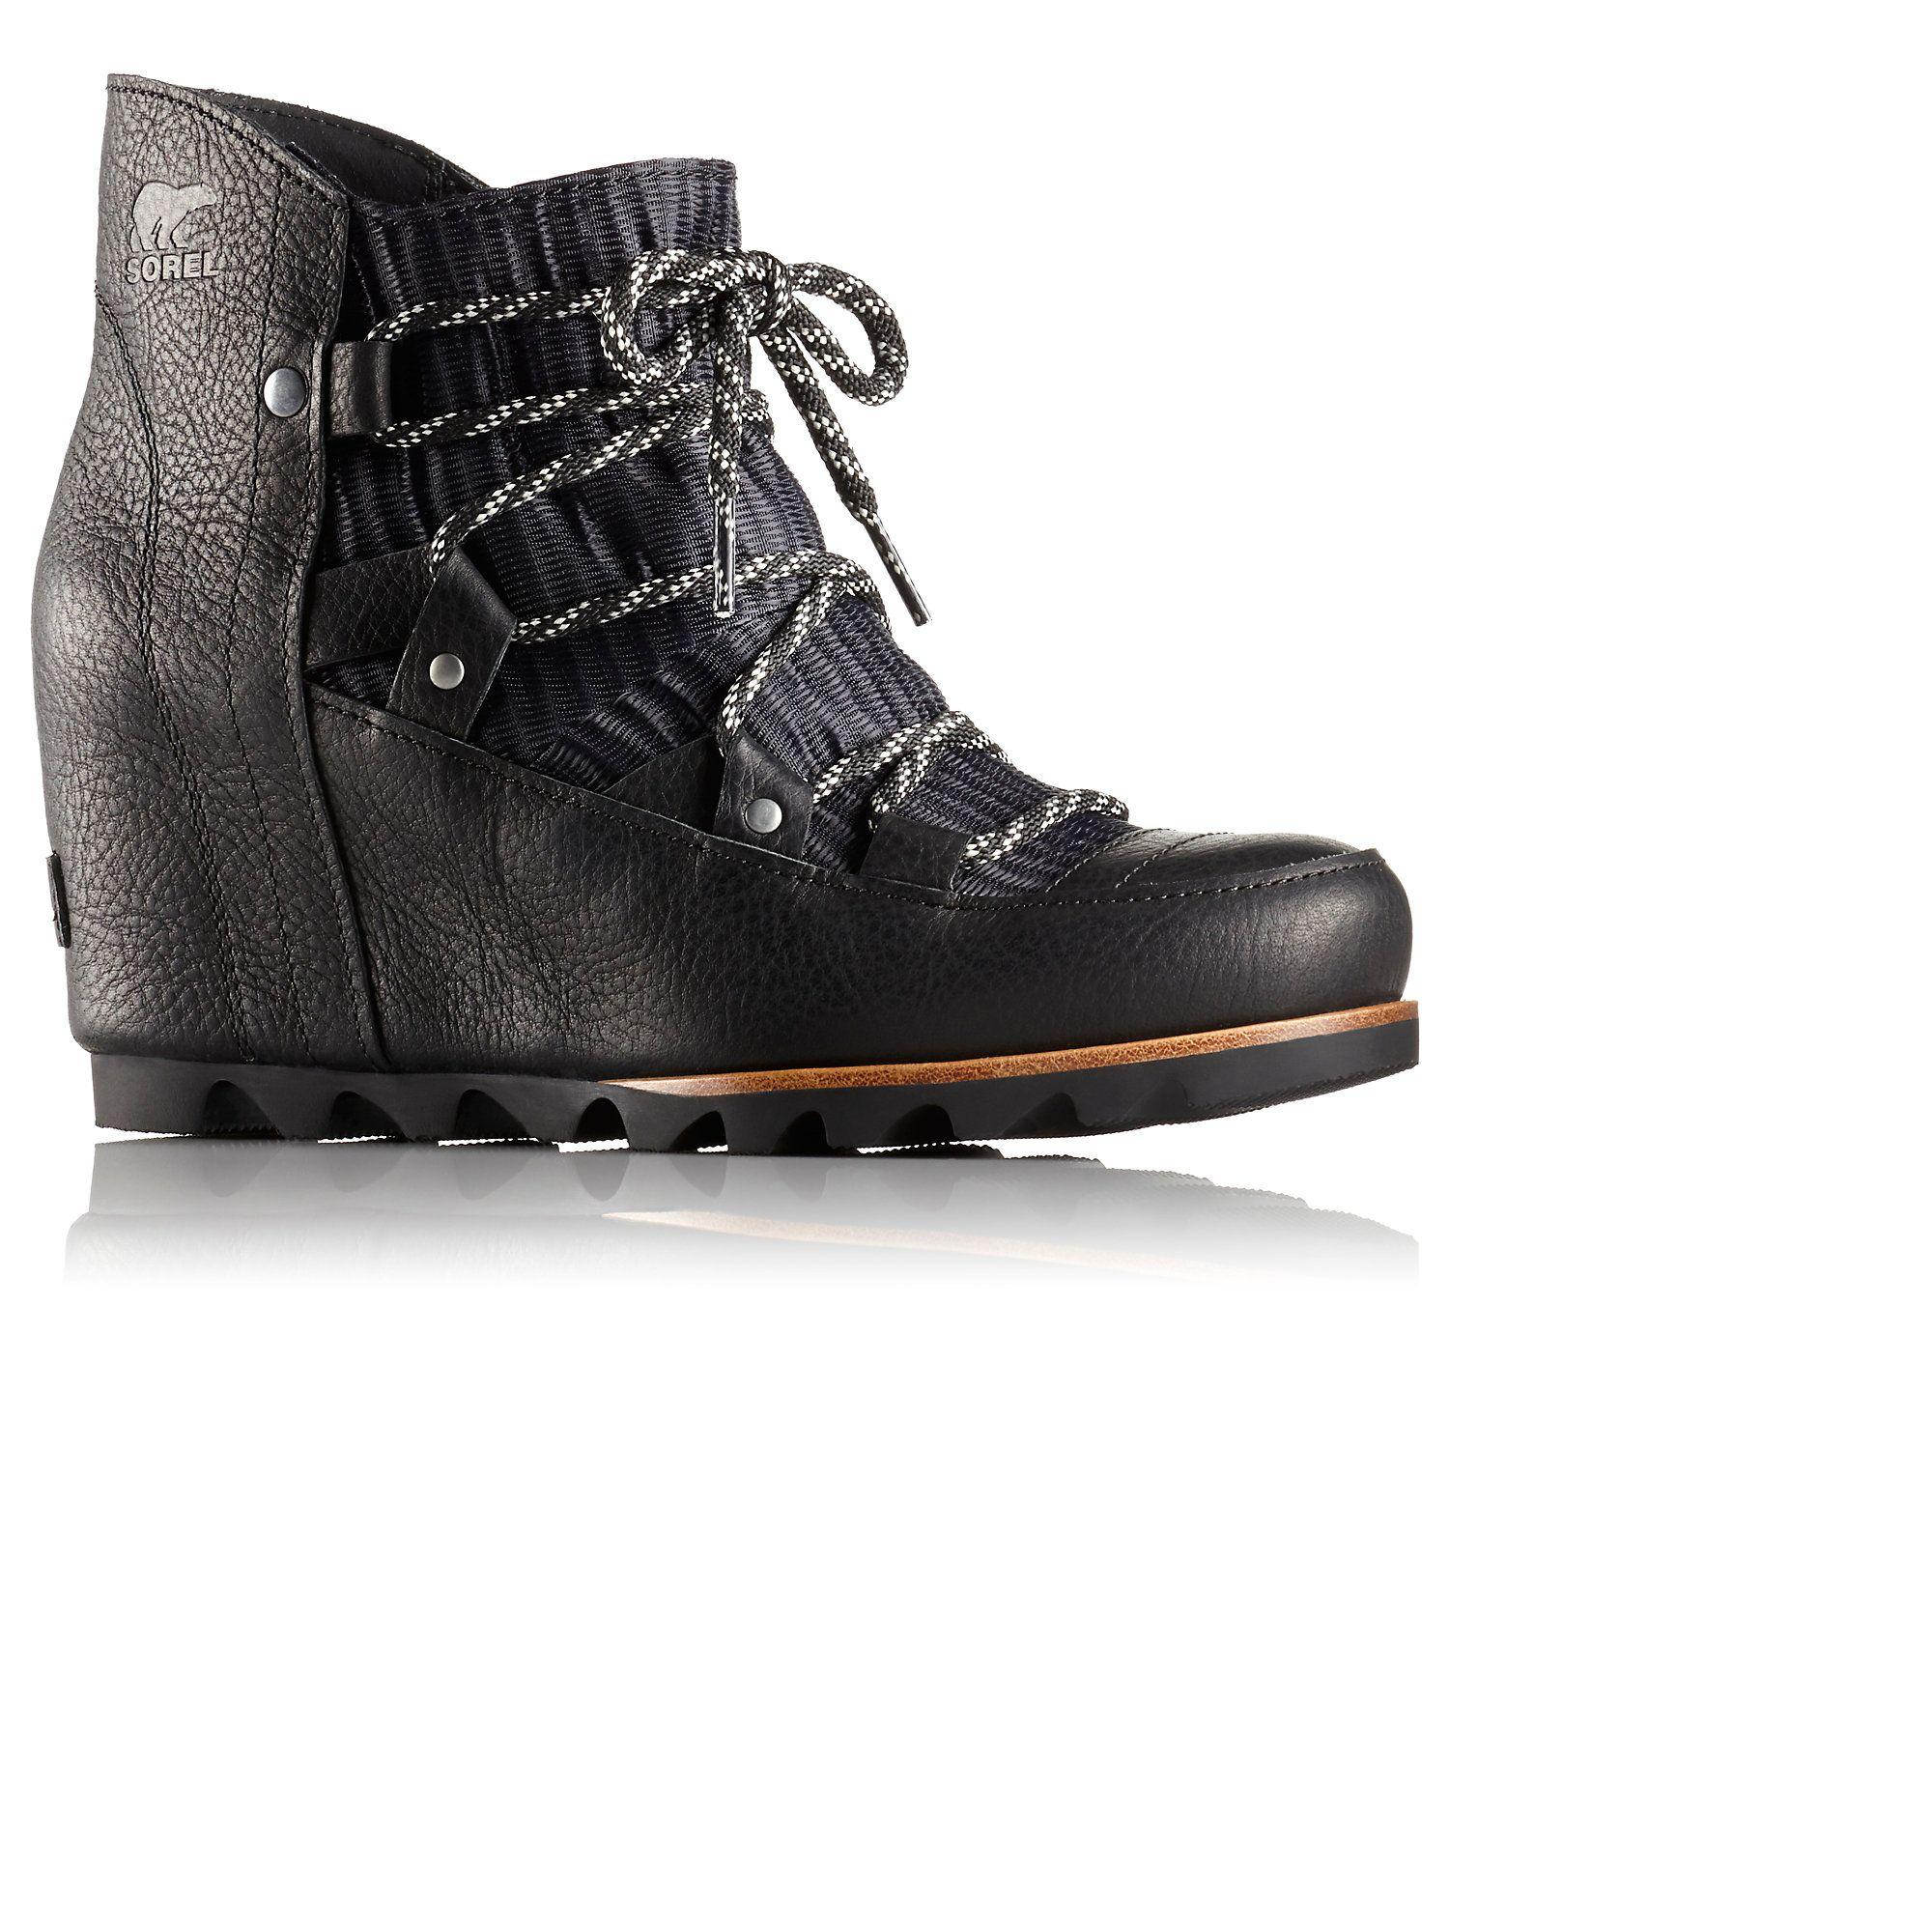 sorel sandy wedge boot black